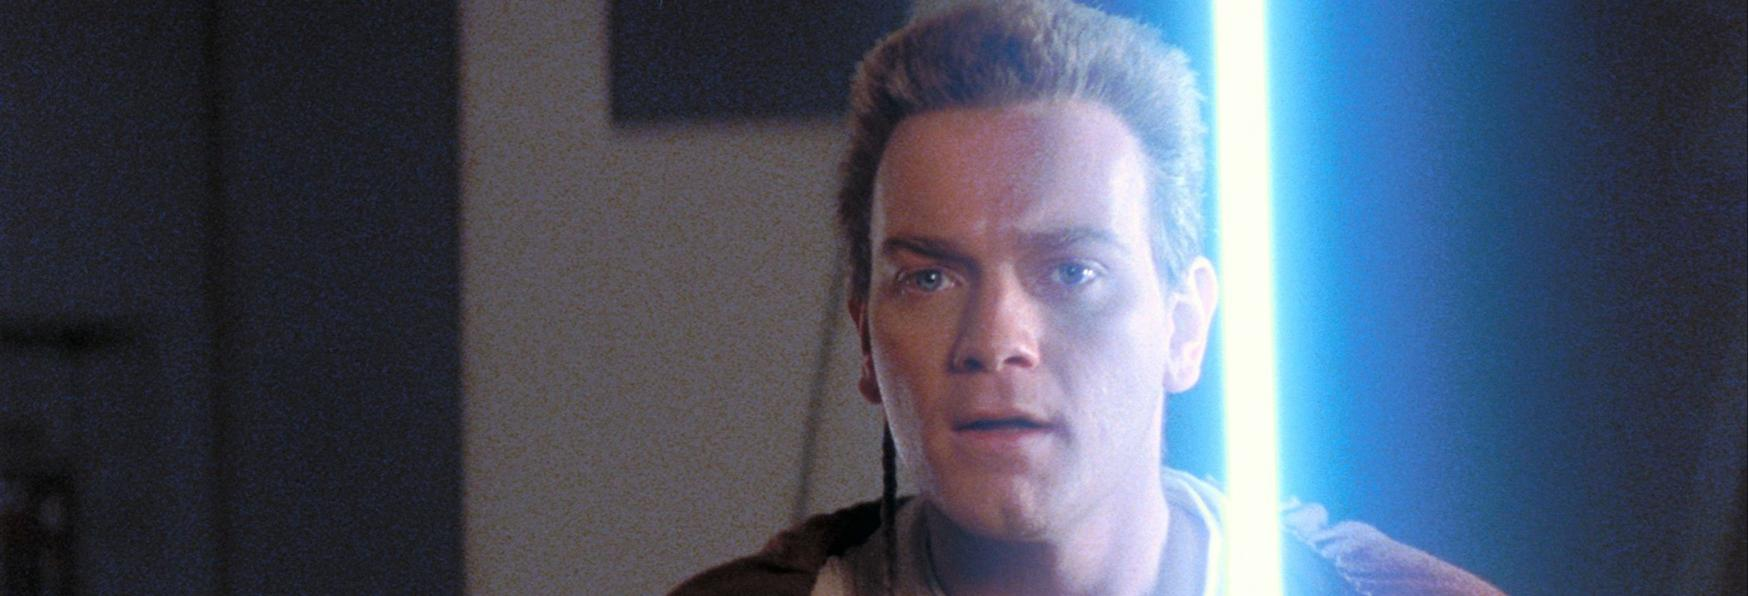 Star Wars: Andor - nel Cast ci sarà anche Ewan McGregor nei panni di Obi-Wan Kenobi